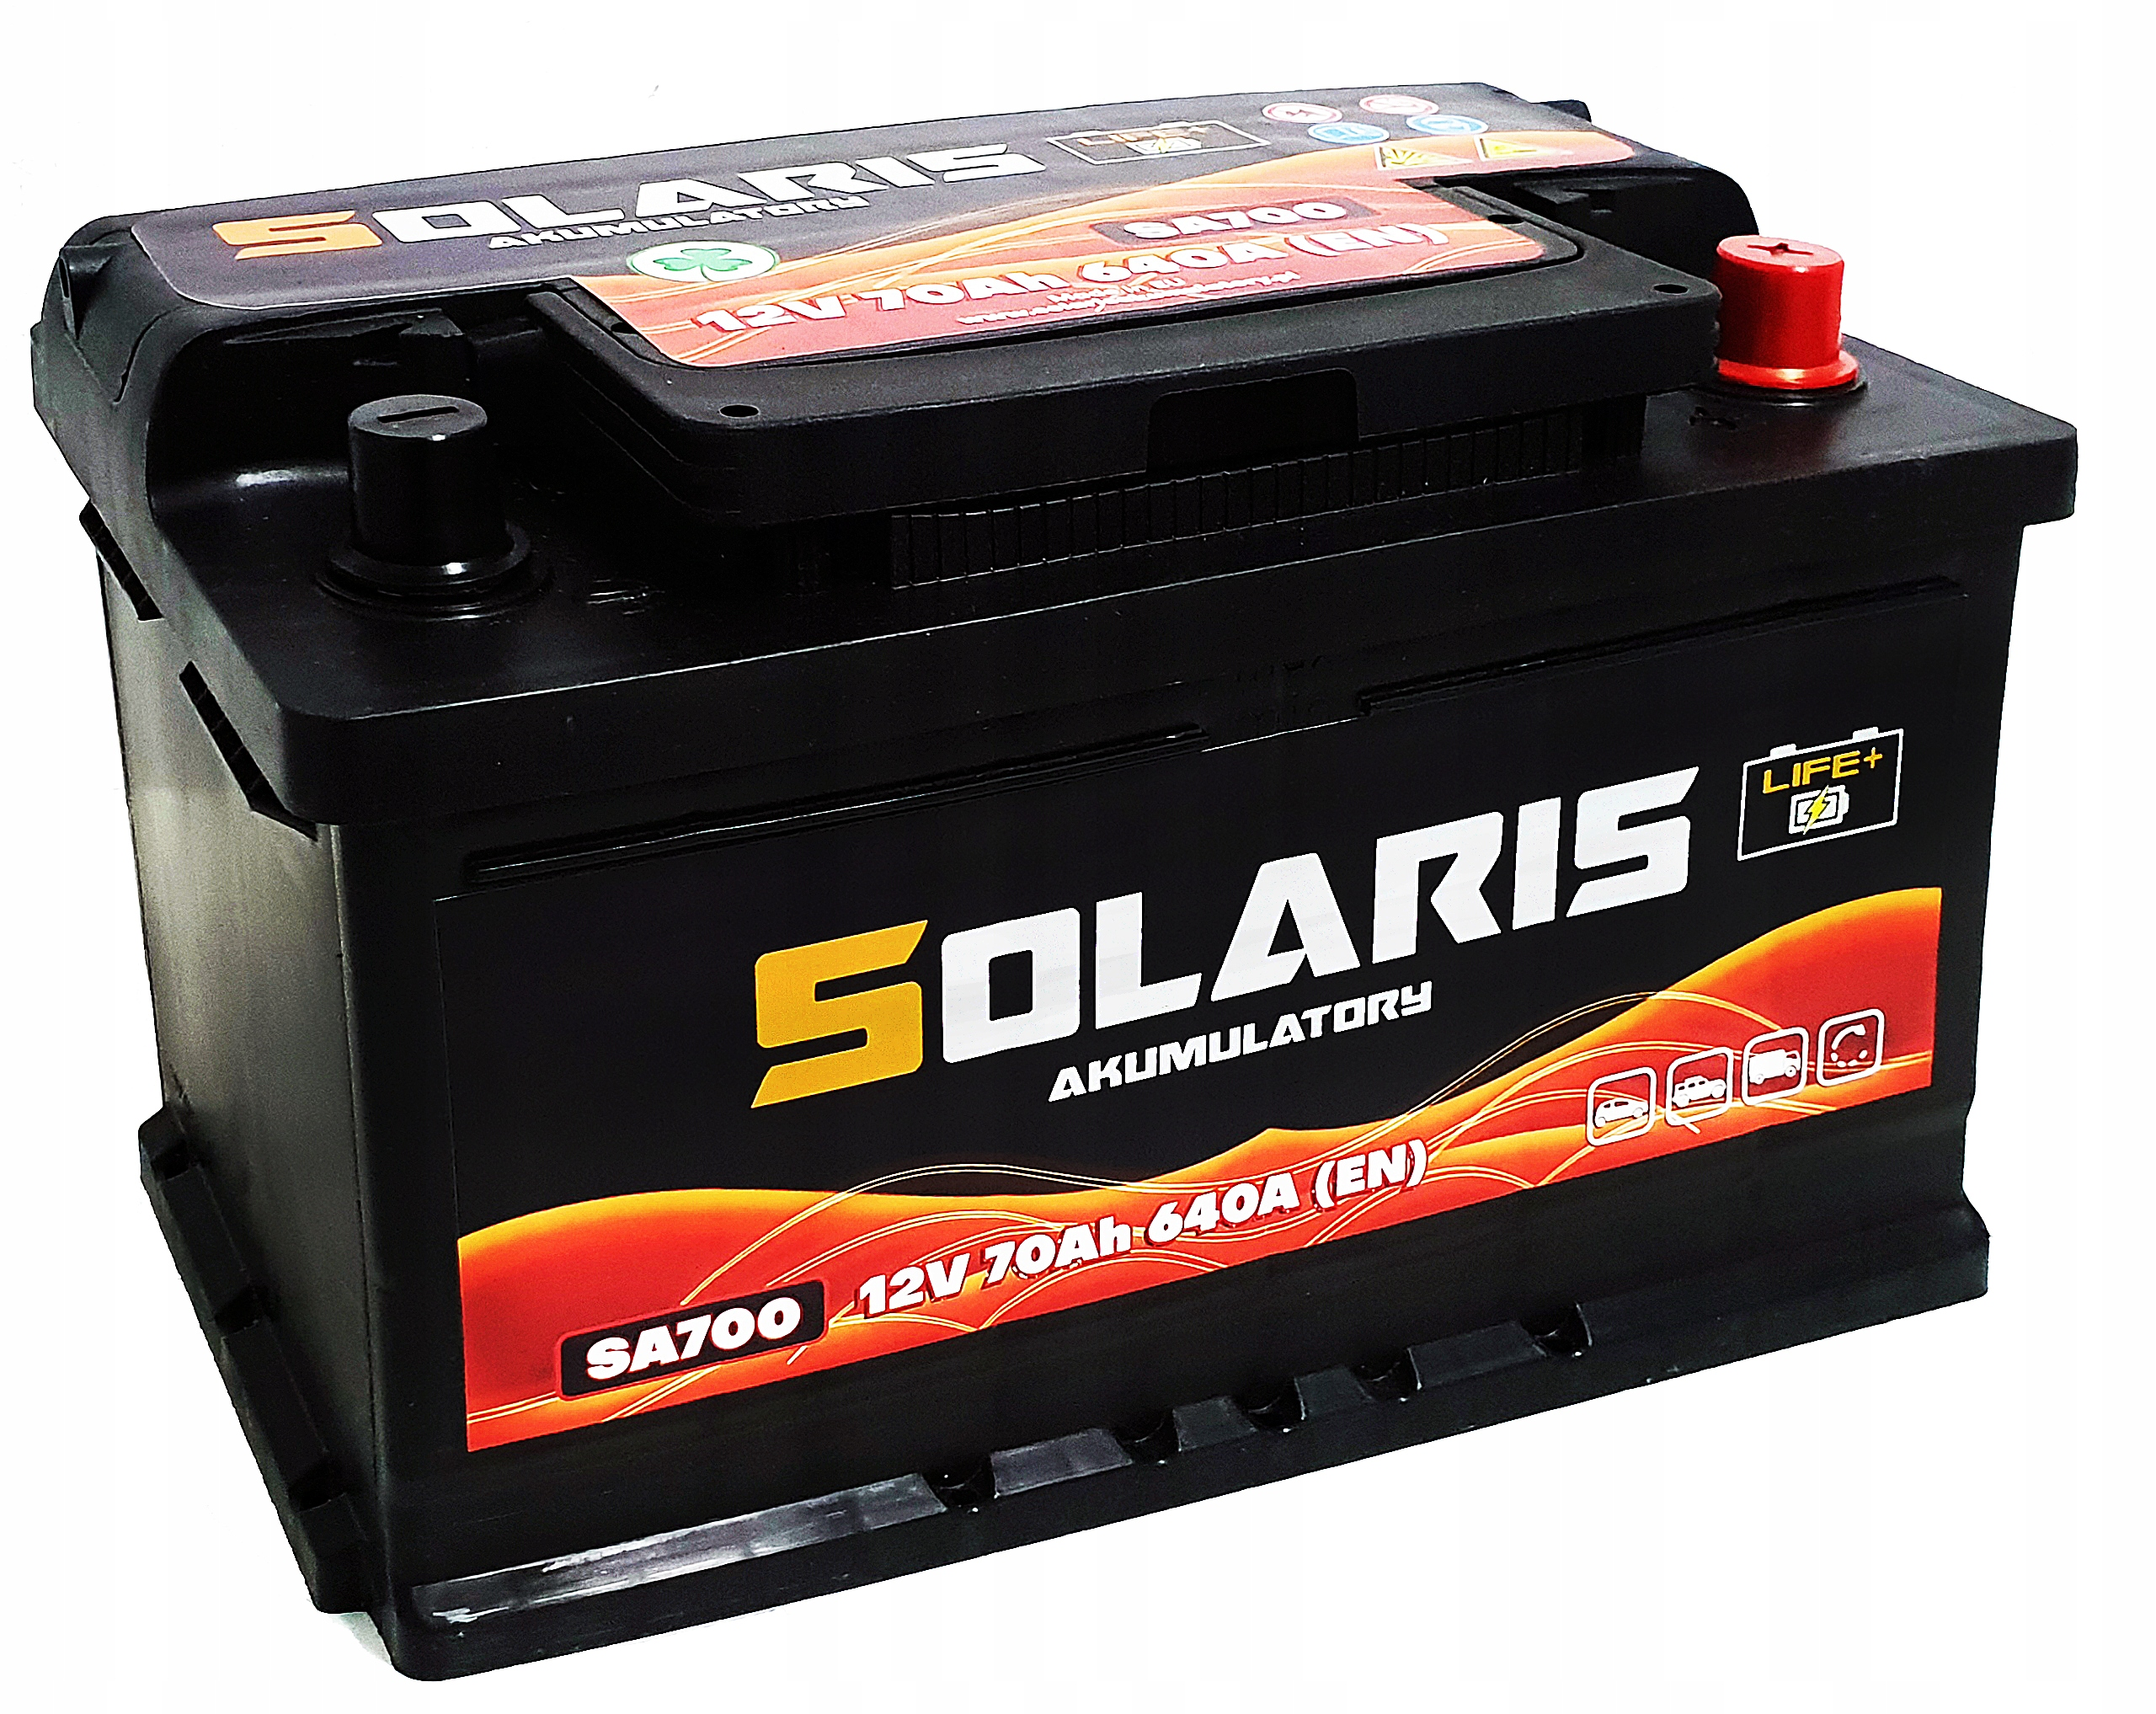 Akumulator Solaris 70ah 640a Myslowice Allegro Pl